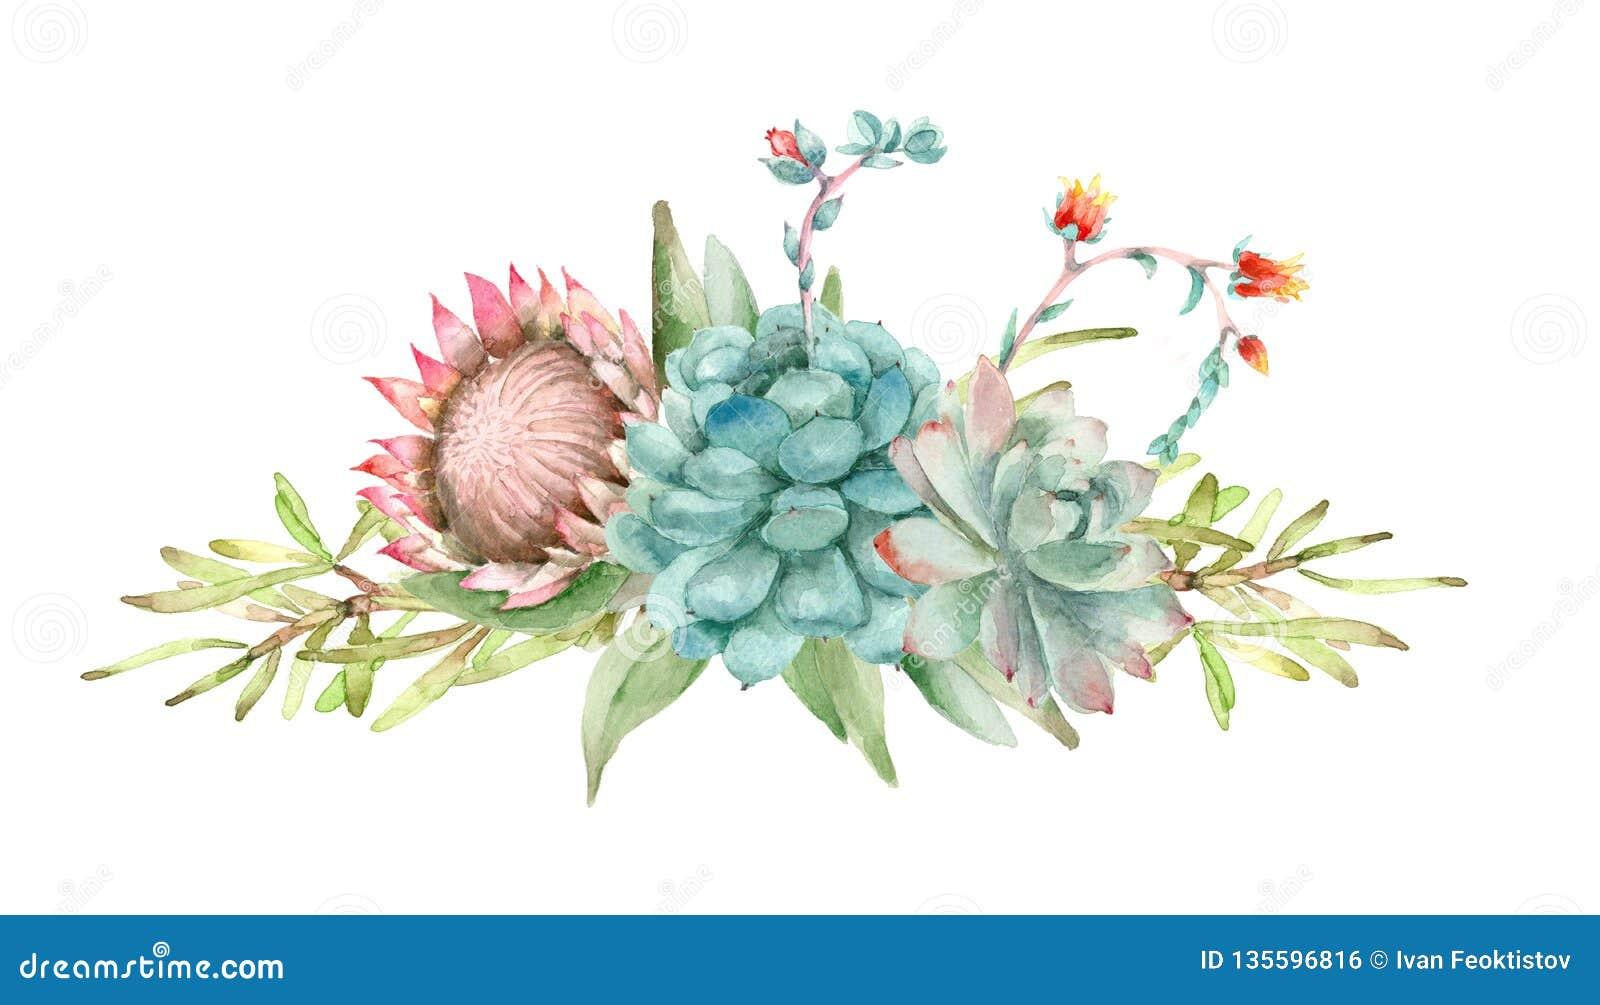 Succulents Bouquet Watercolor Stock Illustration Illustration Of Composition Cactus 135596816